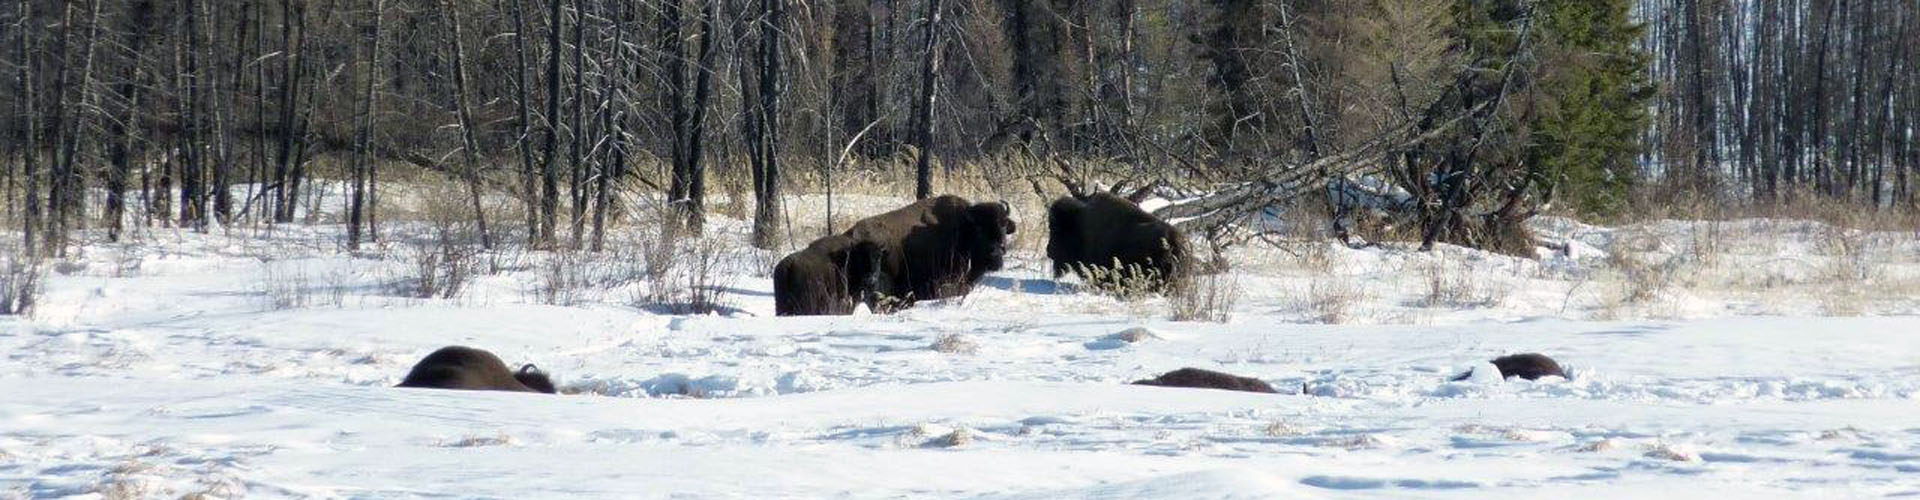 Canada Bison Hunts